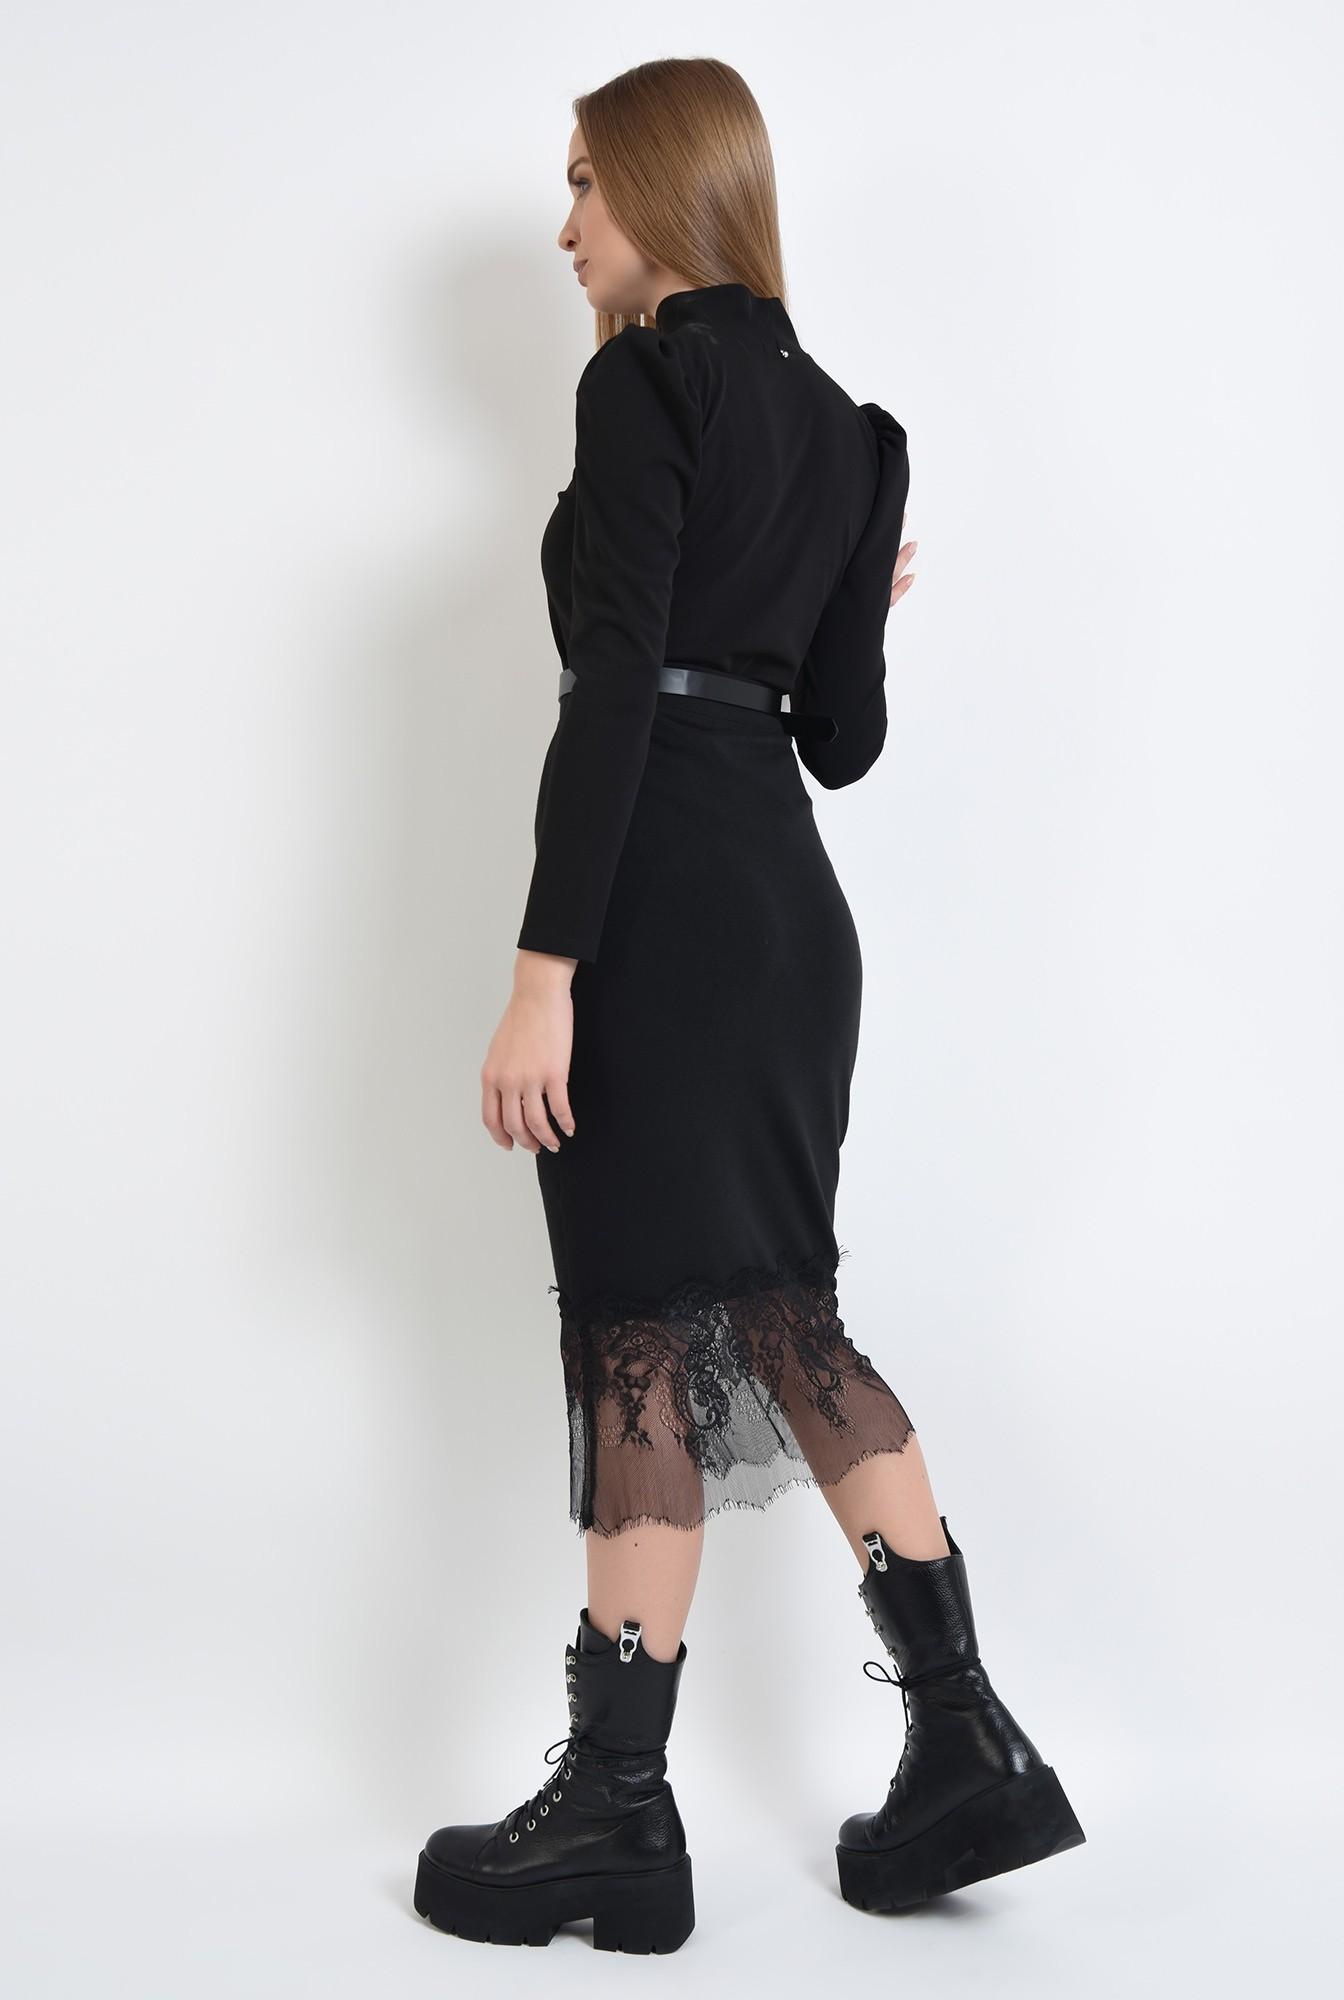 1 - fusta neagra, midi, cu talie inalta